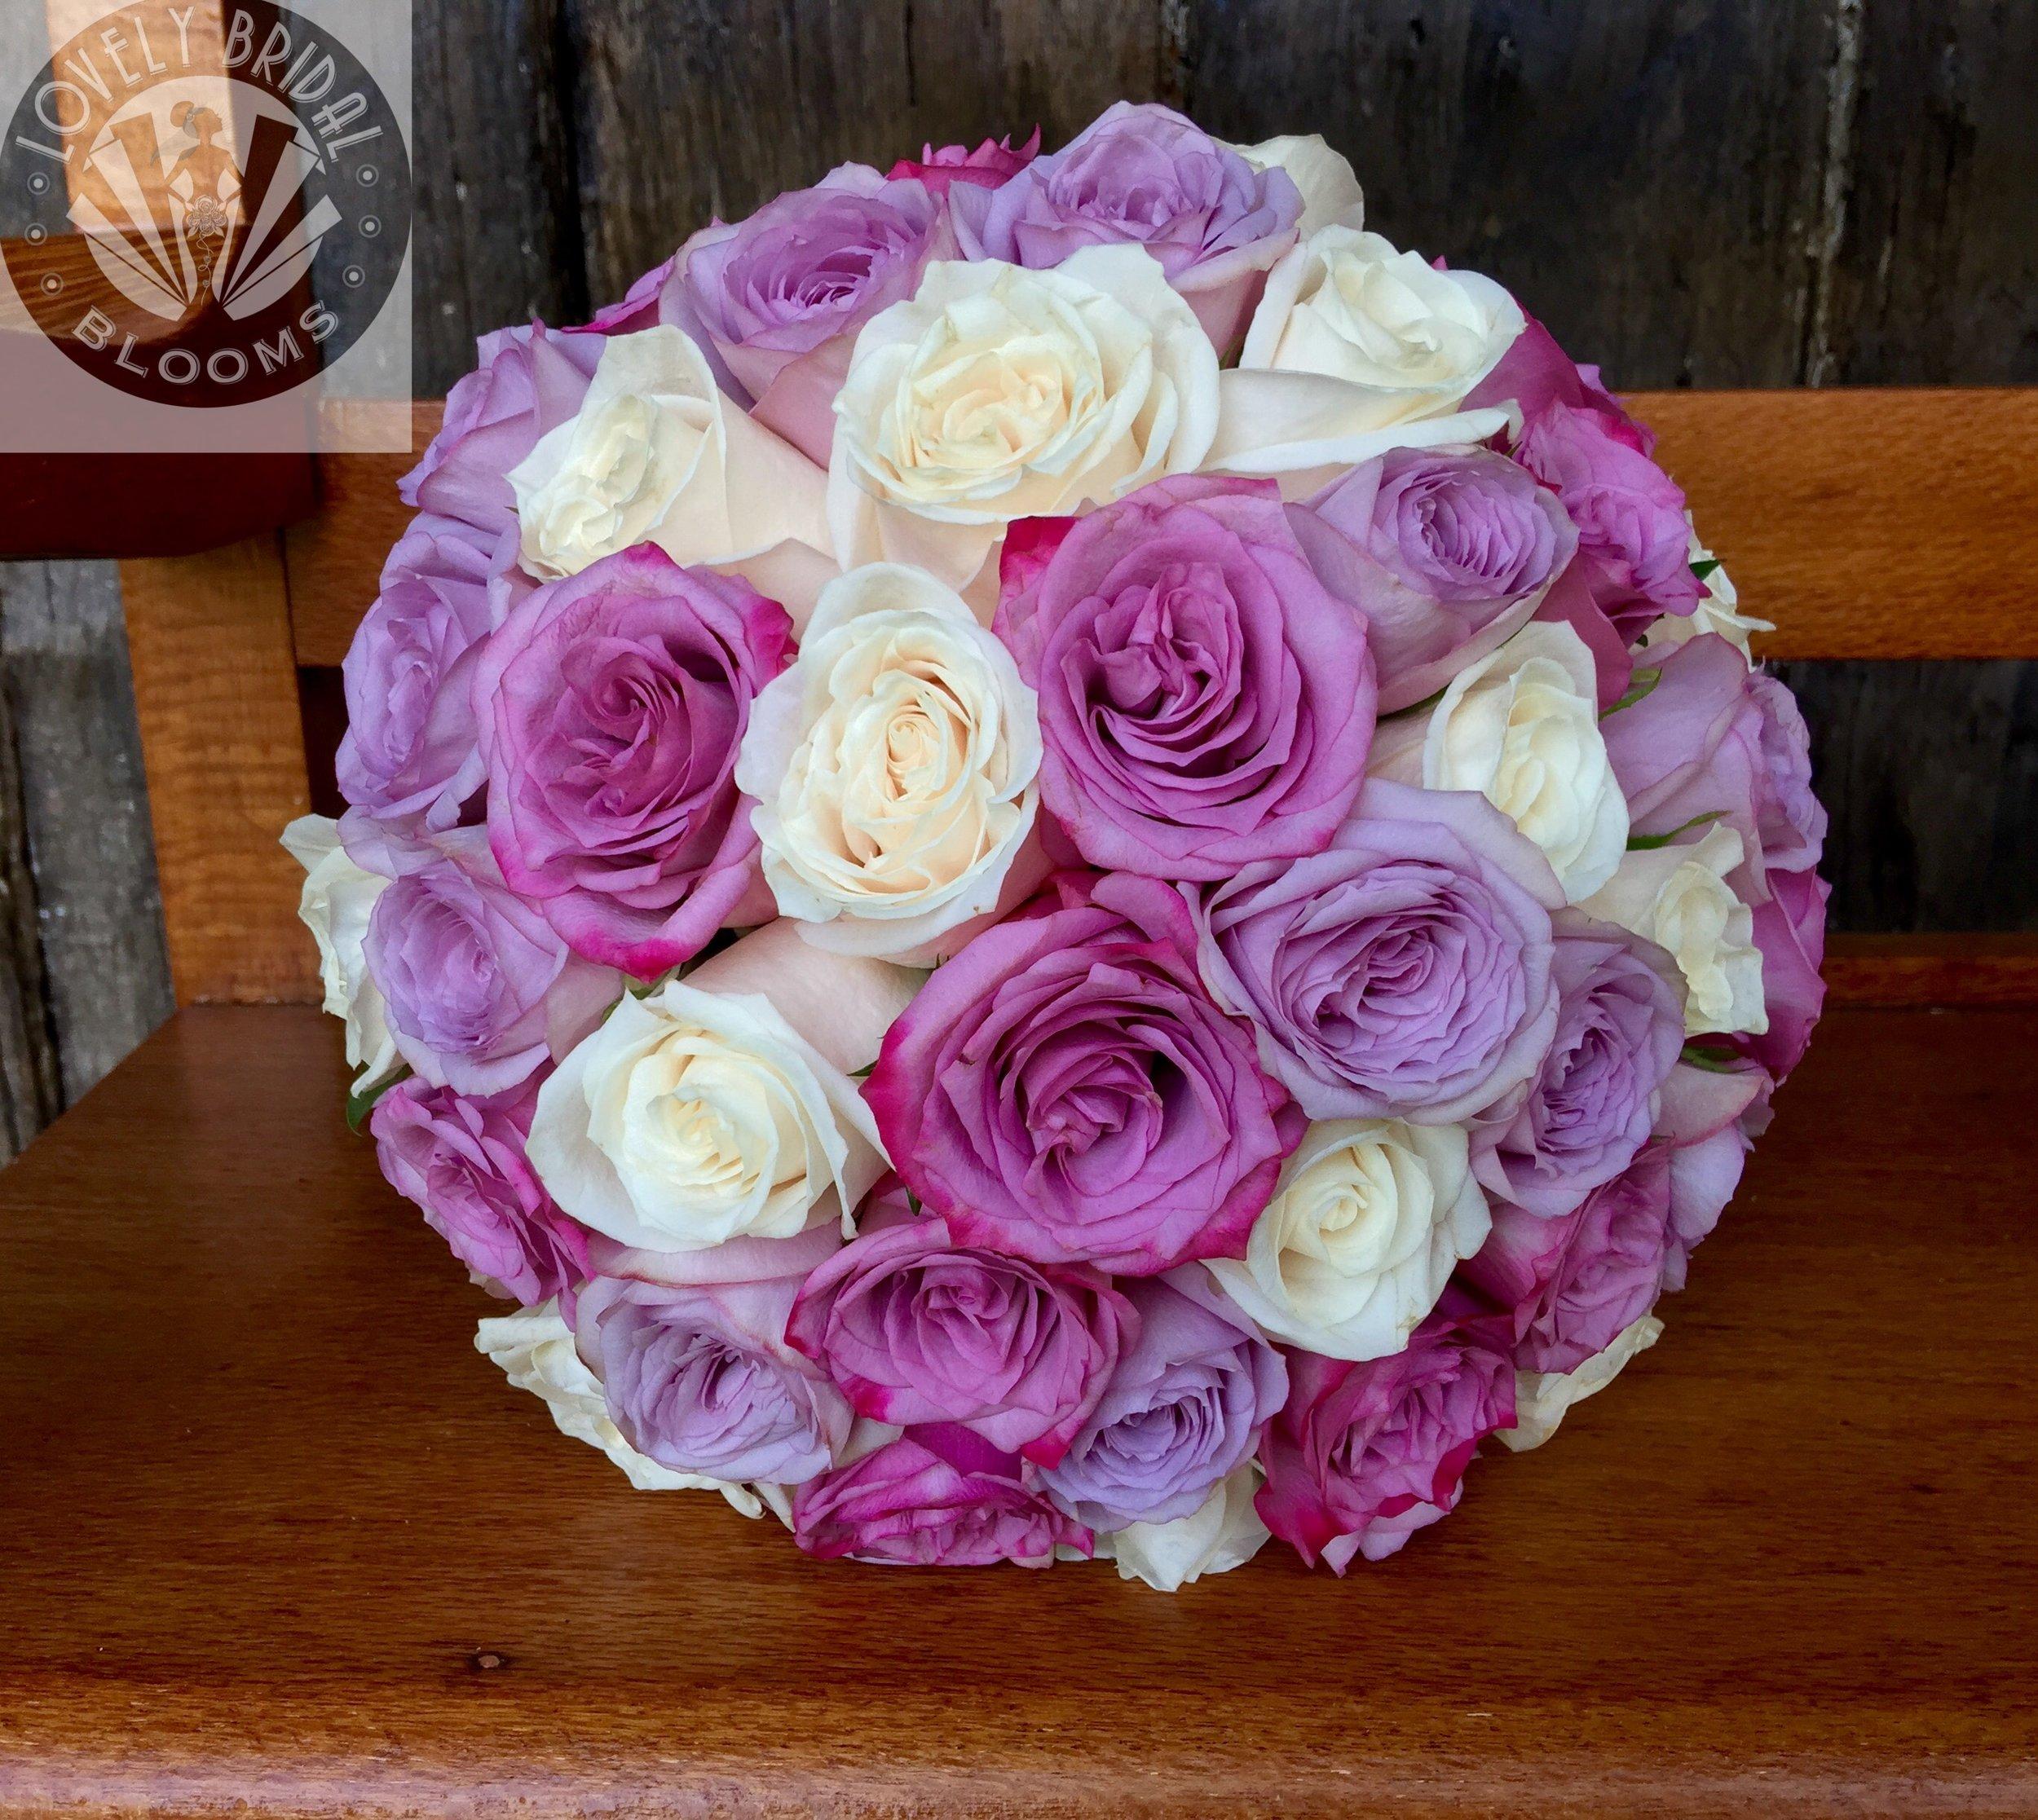 roses PB CW and ivory Kiesty.JPG